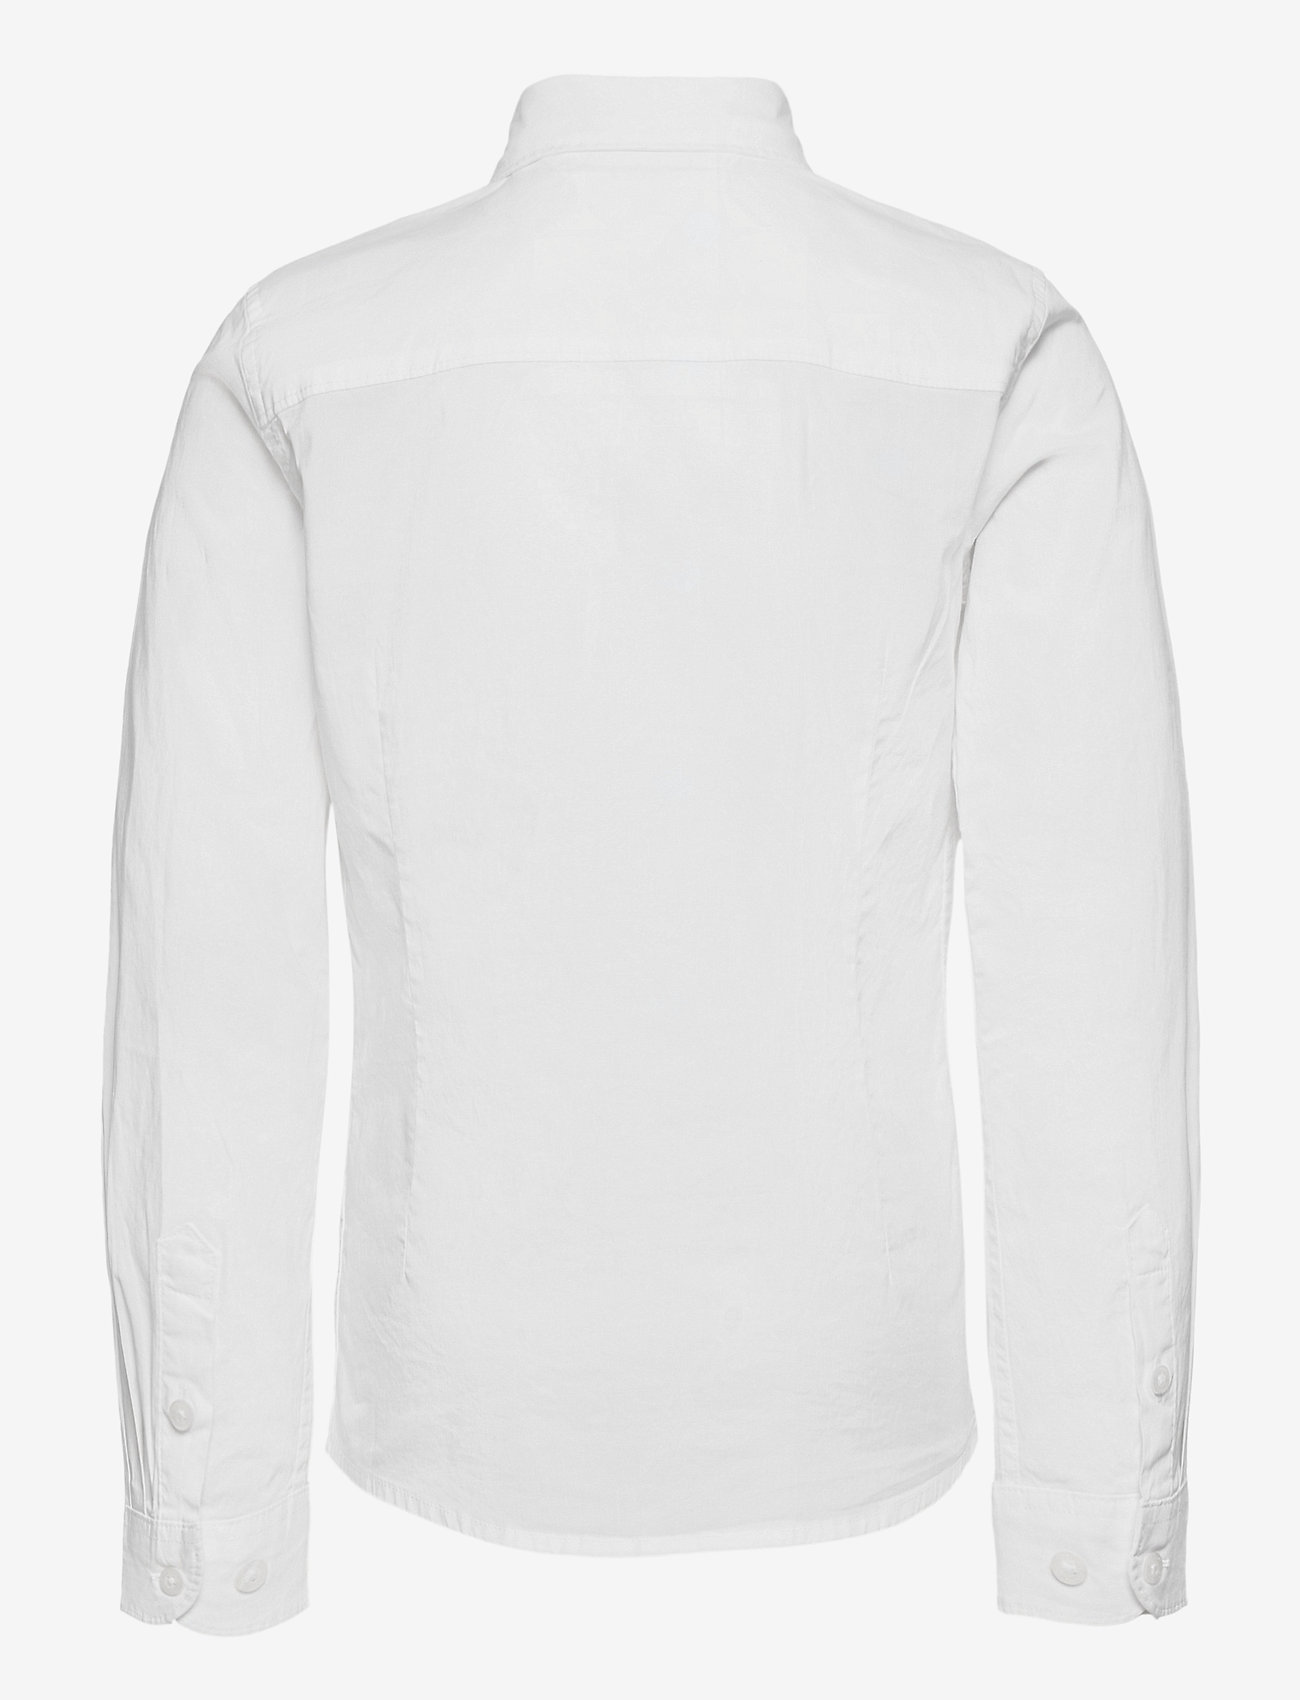 Tommy Hilfiger - BOYS SOLID STRETCH POPLIN SHIRT L/S - overhemden - bright white - 1